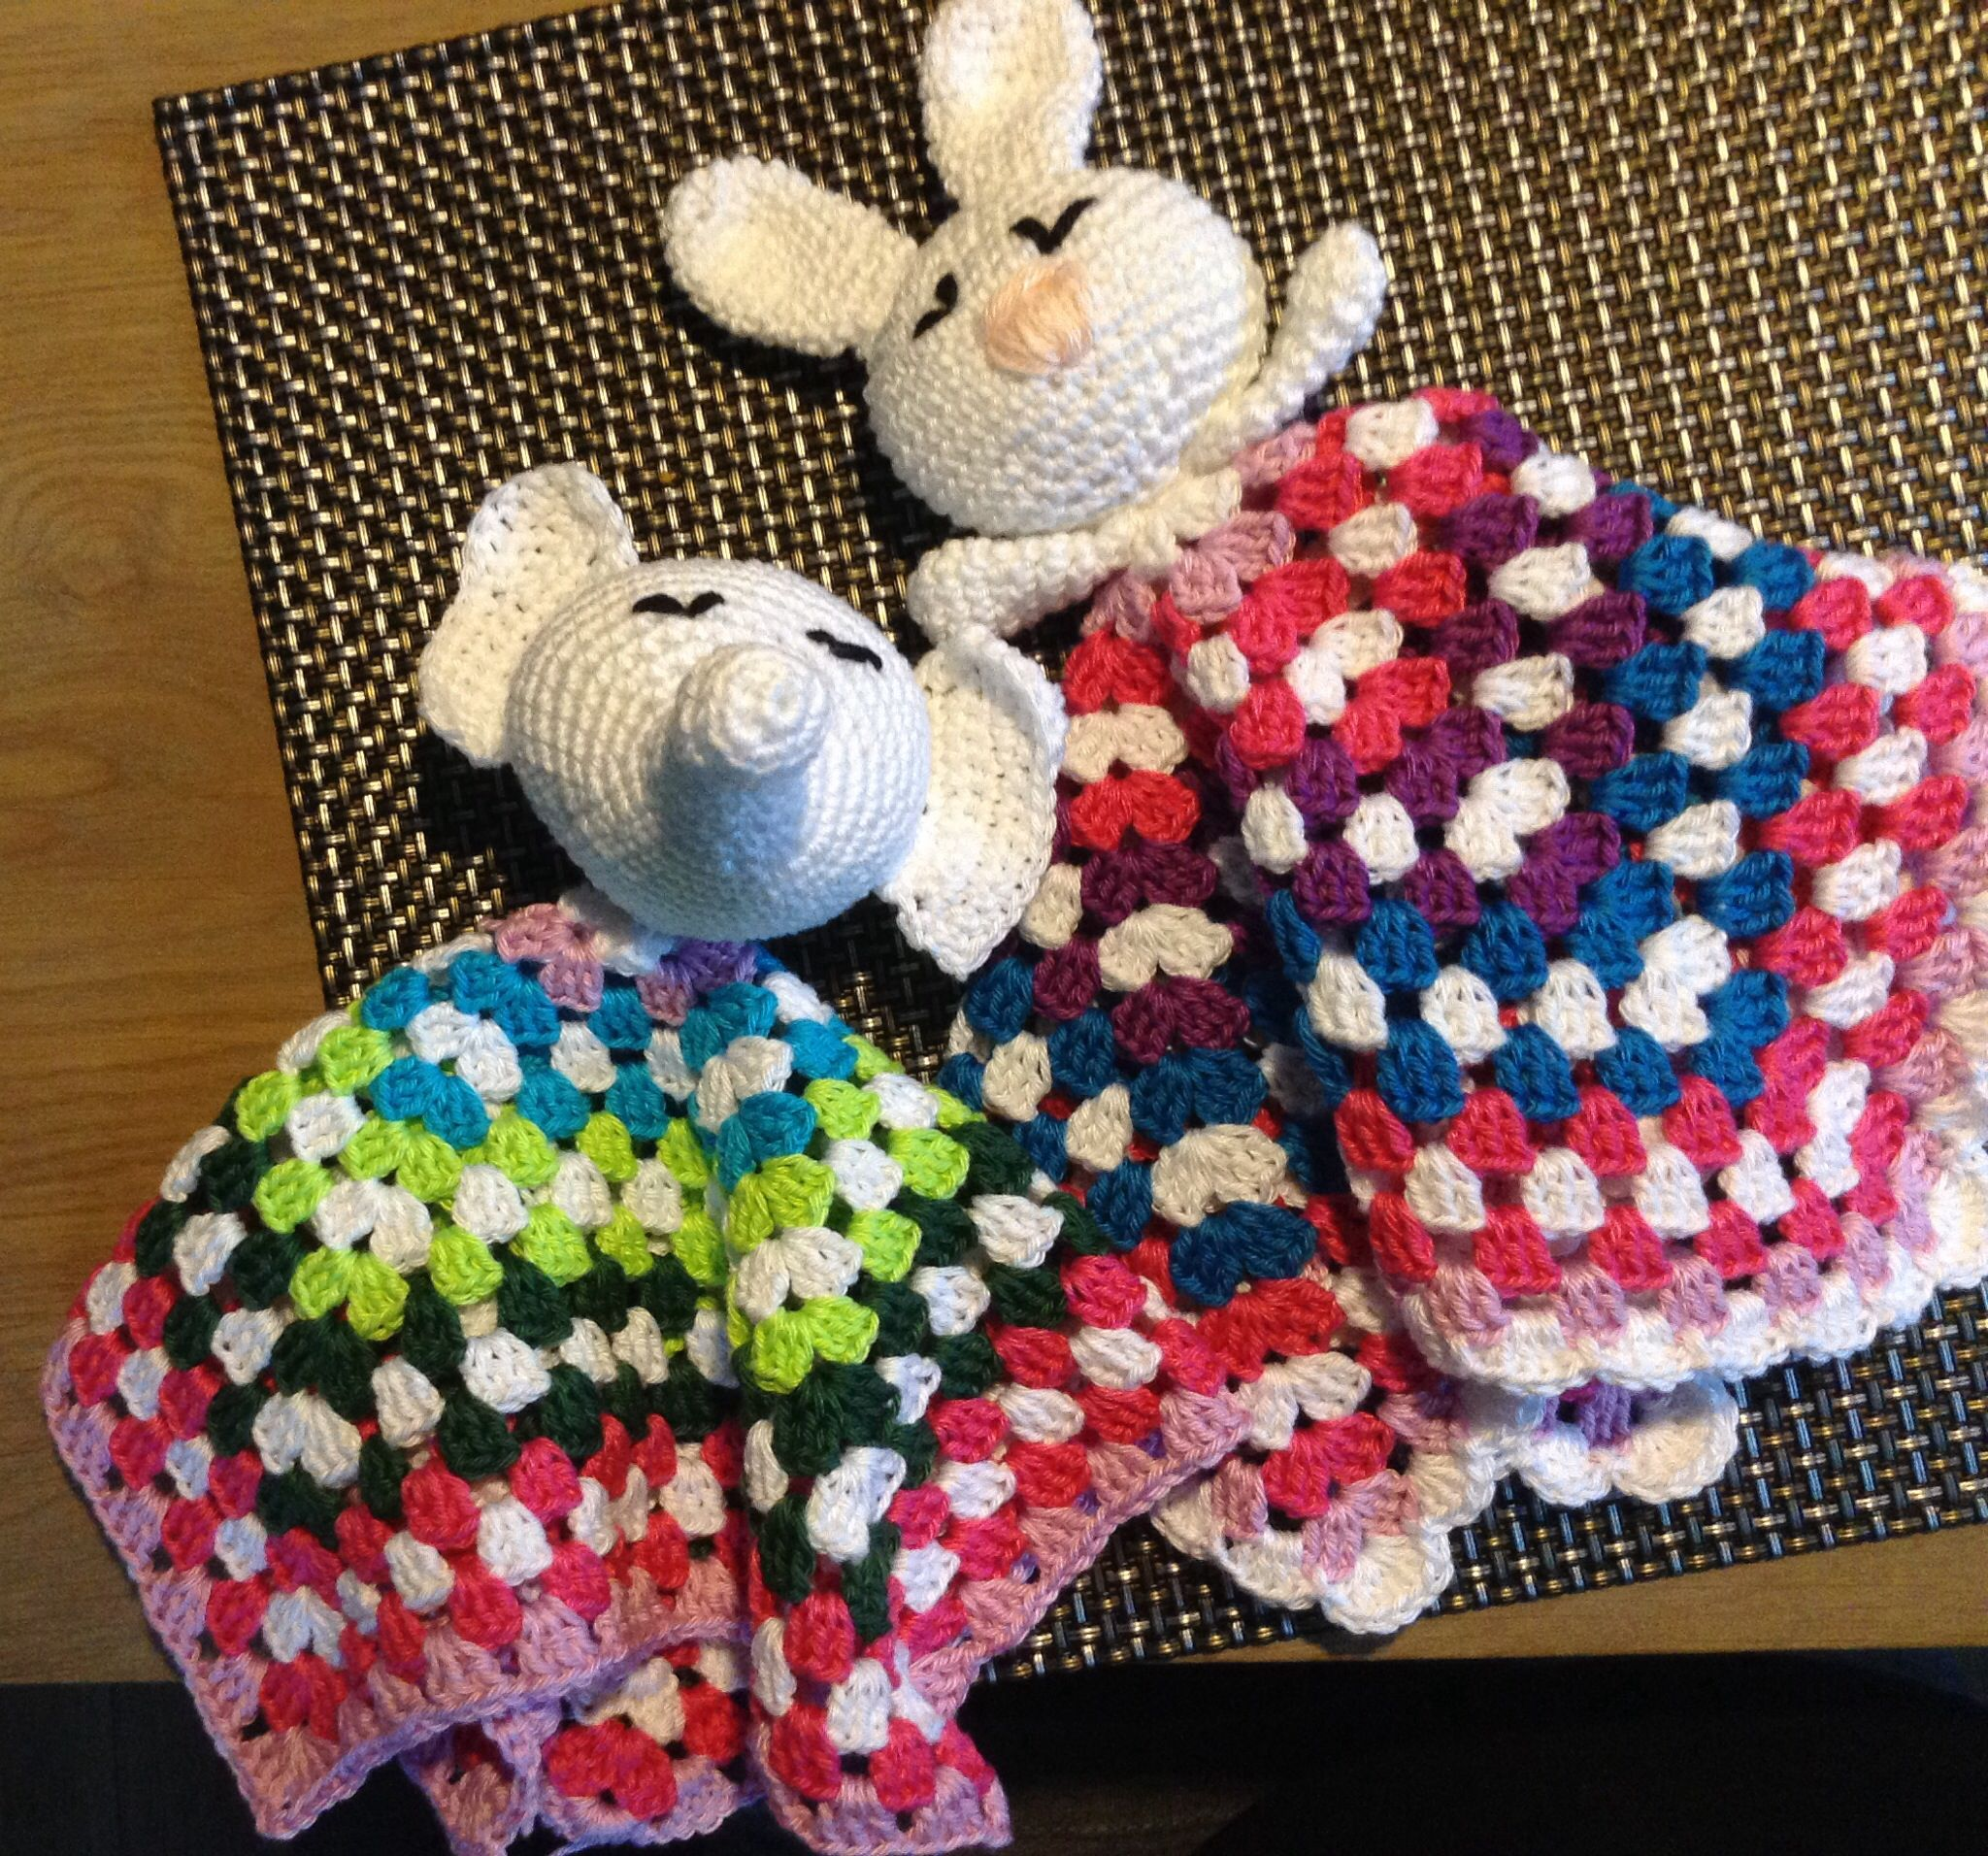 Free Crochet Patterns For Baby Blankets Newborns Handmade